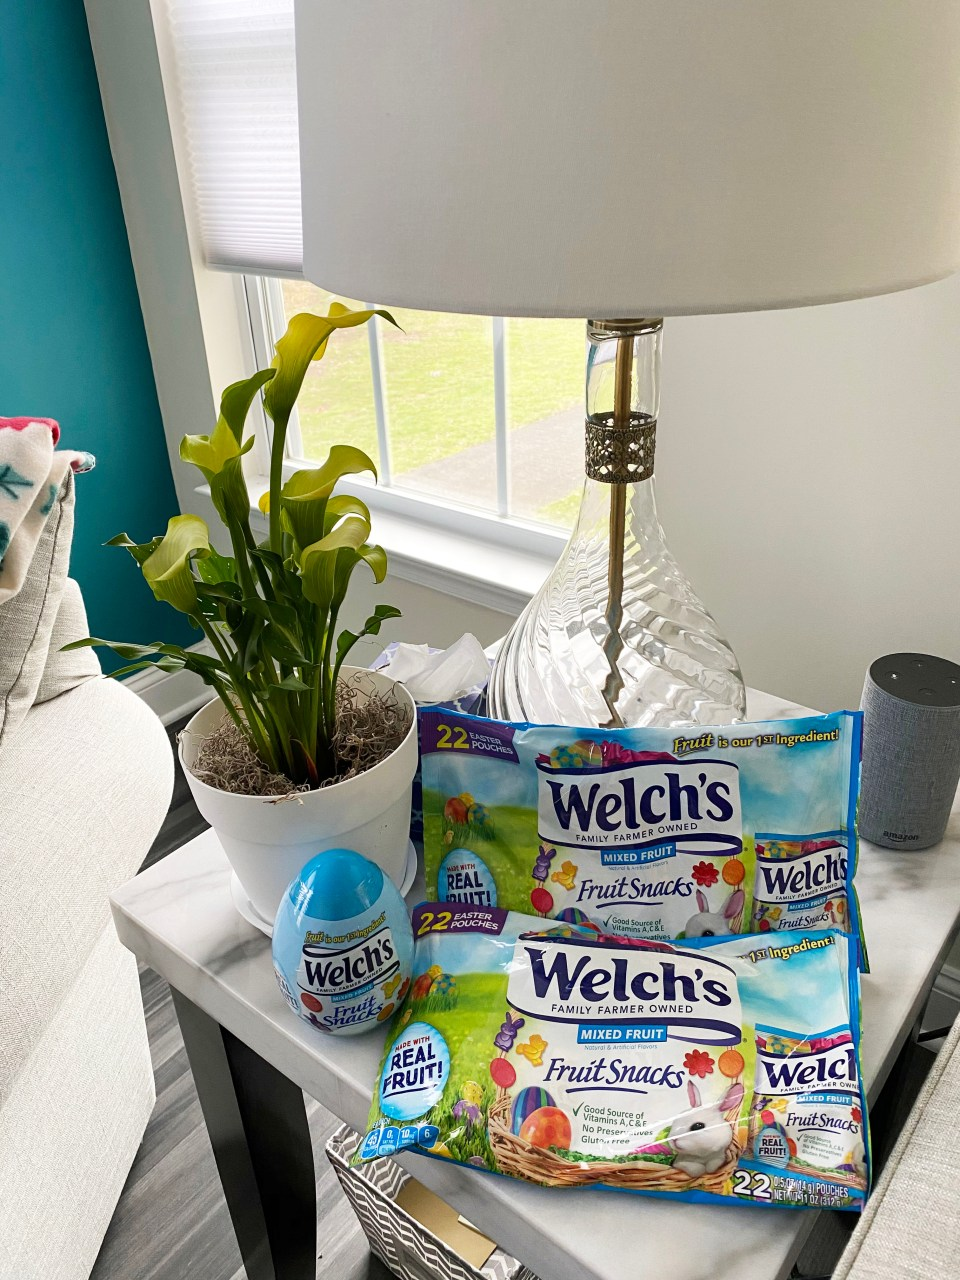 Welch's Easter Fruit Snacks